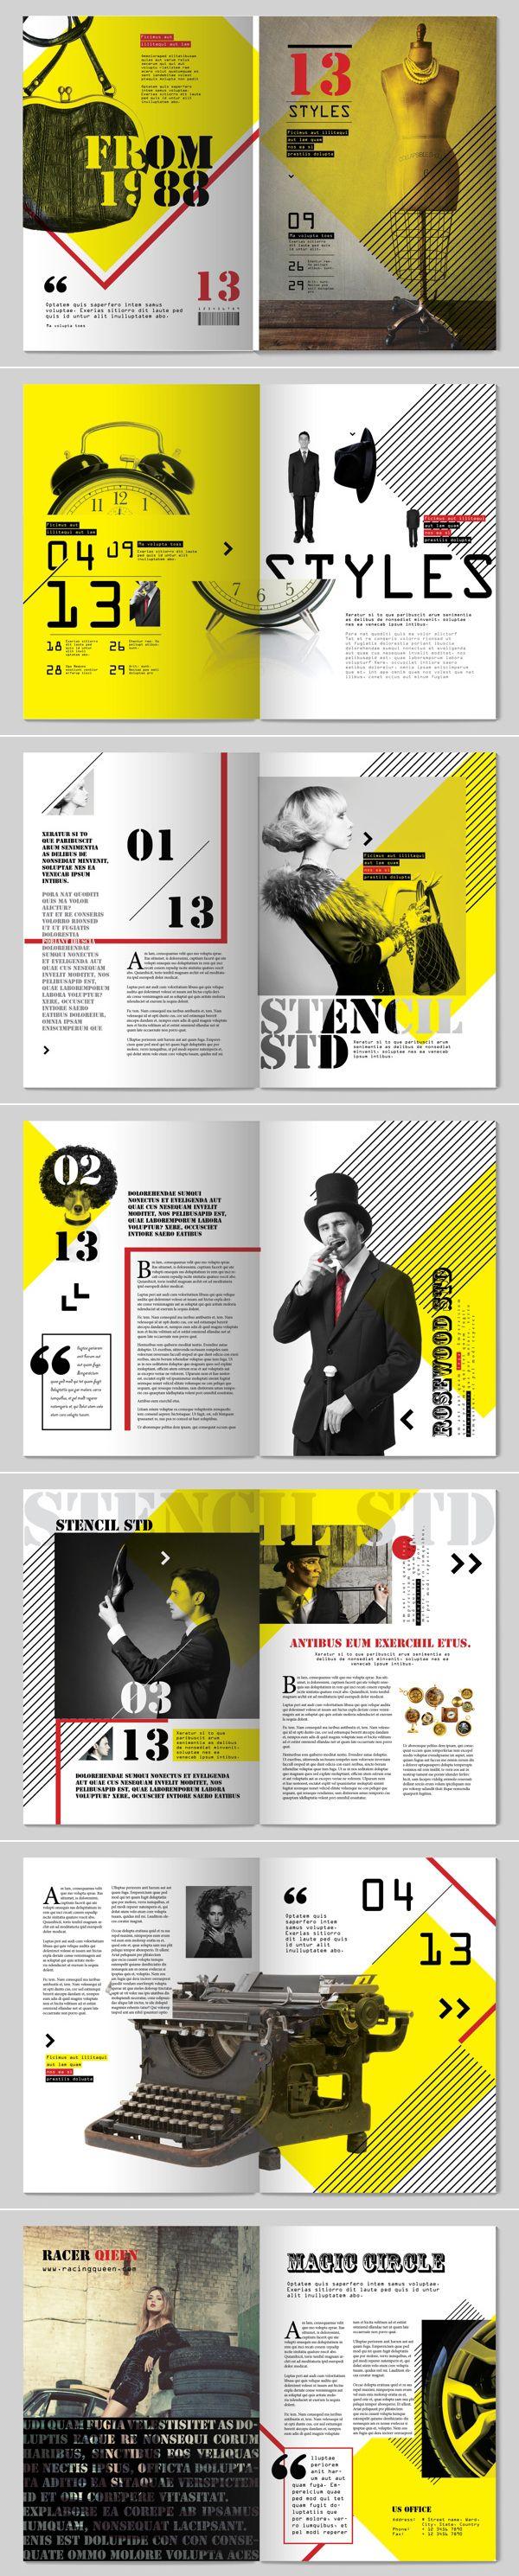 13 Styles Magazine Design // by Tony Huynh via behance